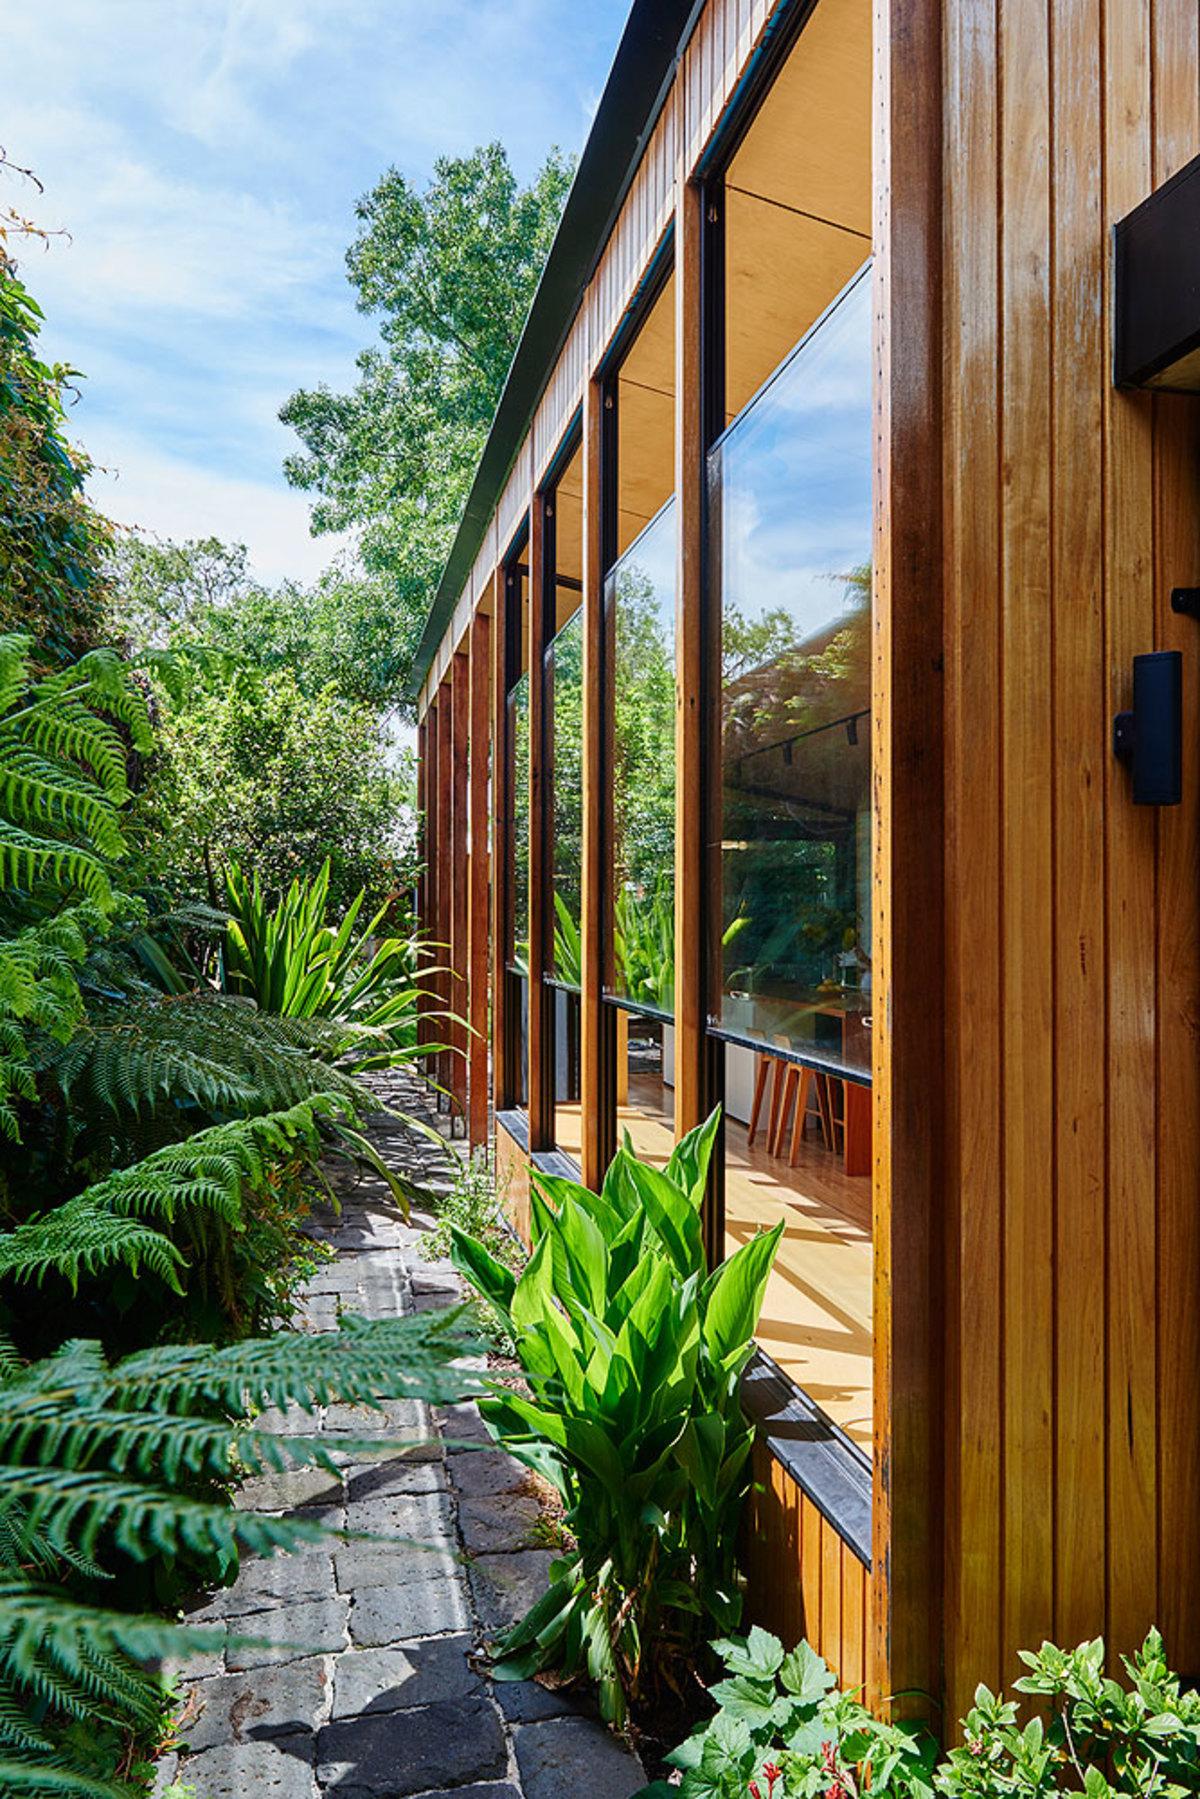 Bluestone Terrace Pavillion By Altereco Designs In Williamstown, Heritage Renovation, Williamstown, Vic (2)